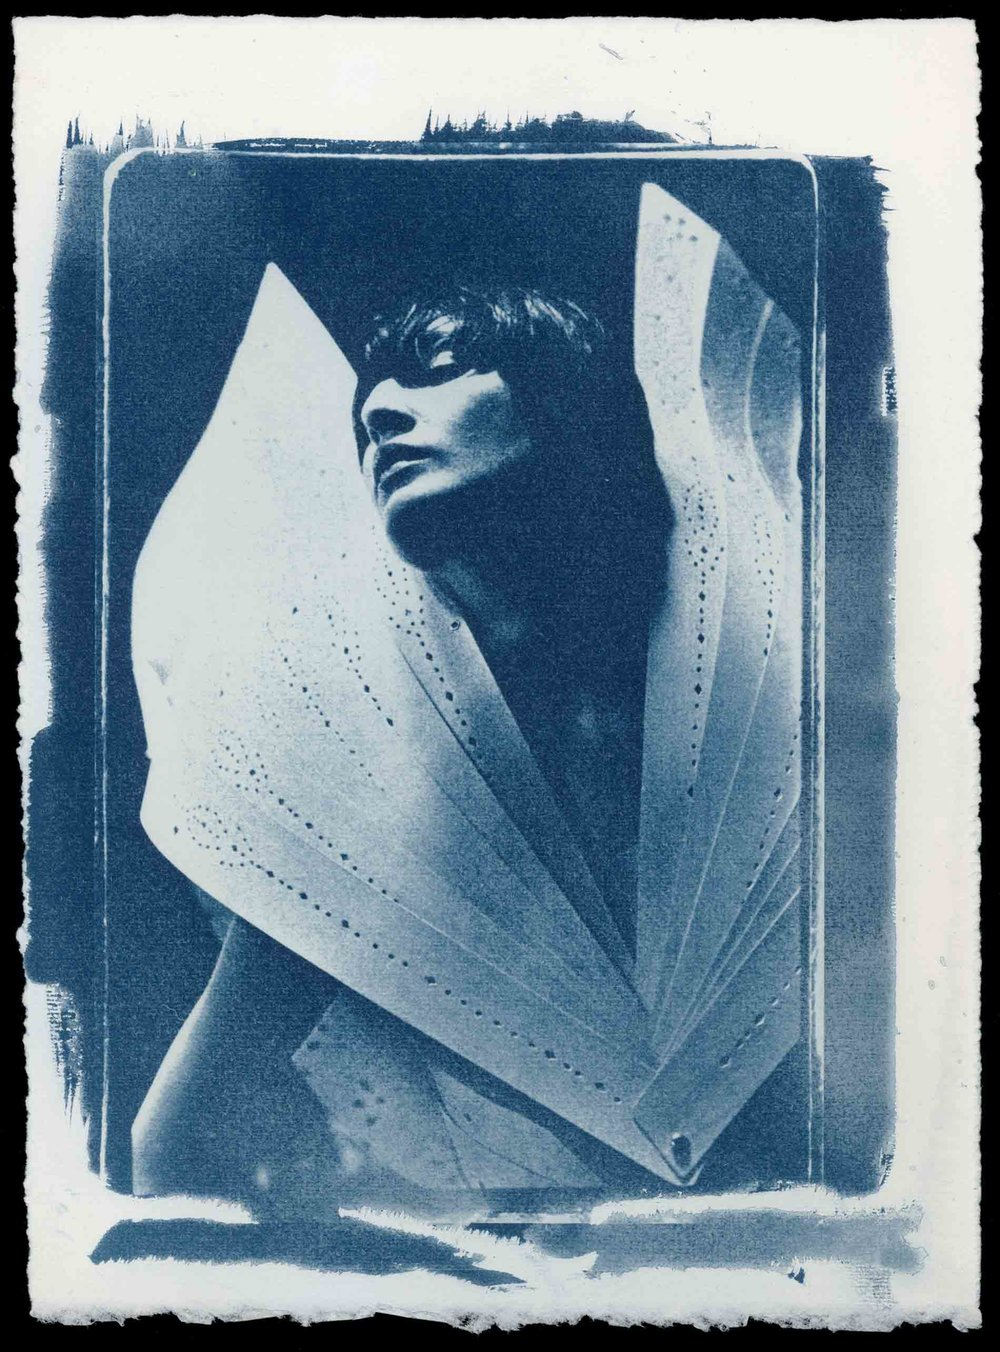 Ann Ray,  Erin as Angel , London, 1998 (N° 13, Erin O'Connor, cyanotype by the artist). Courtesy of the artist.